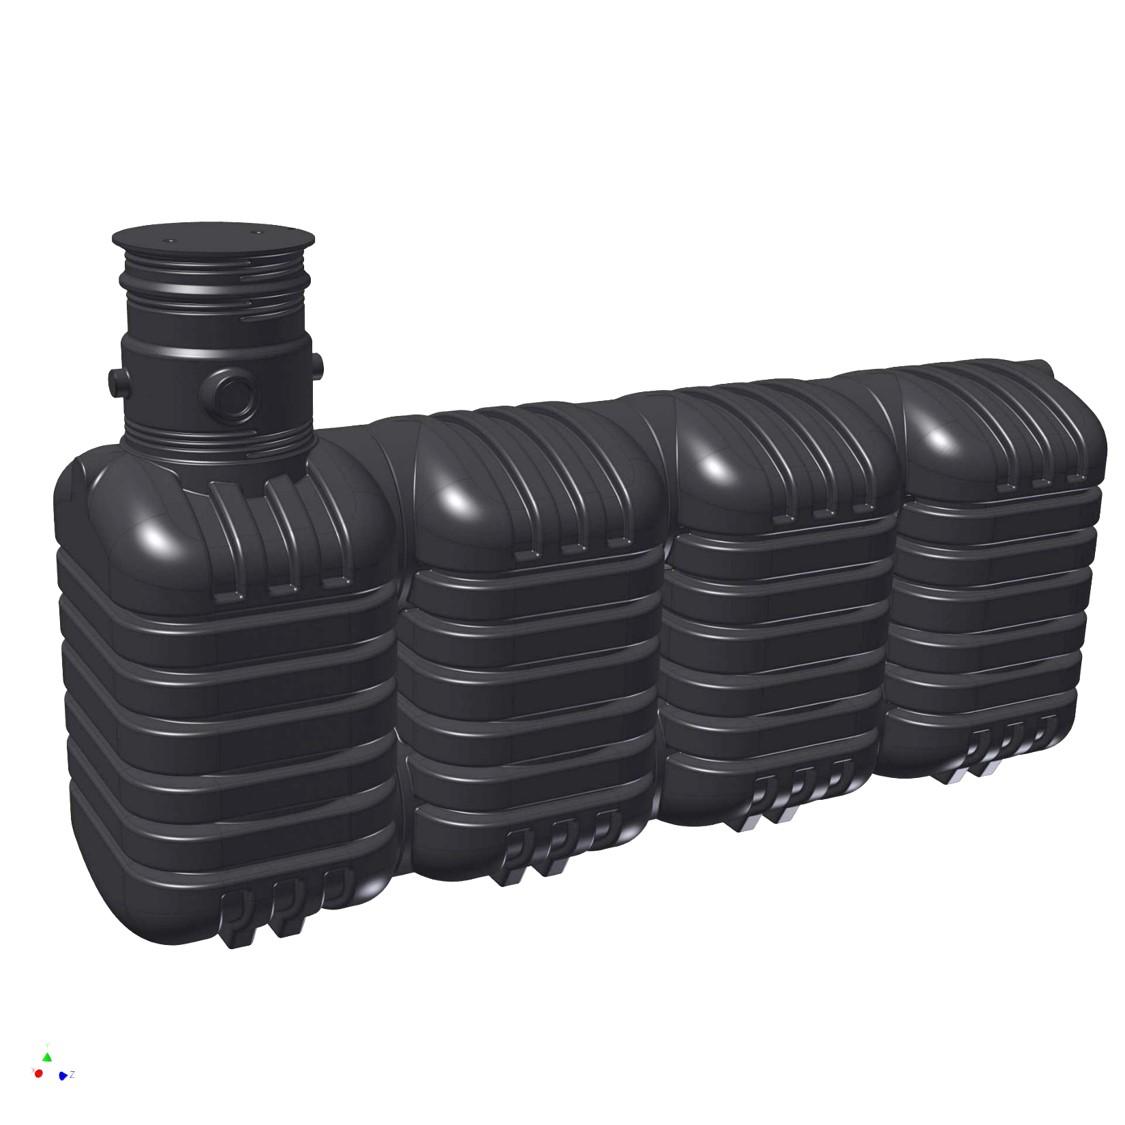 regenwasser tank zisterne erdtank speicher st basic ebay. Black Bedroom Furniture Sets. Home Design Ideas